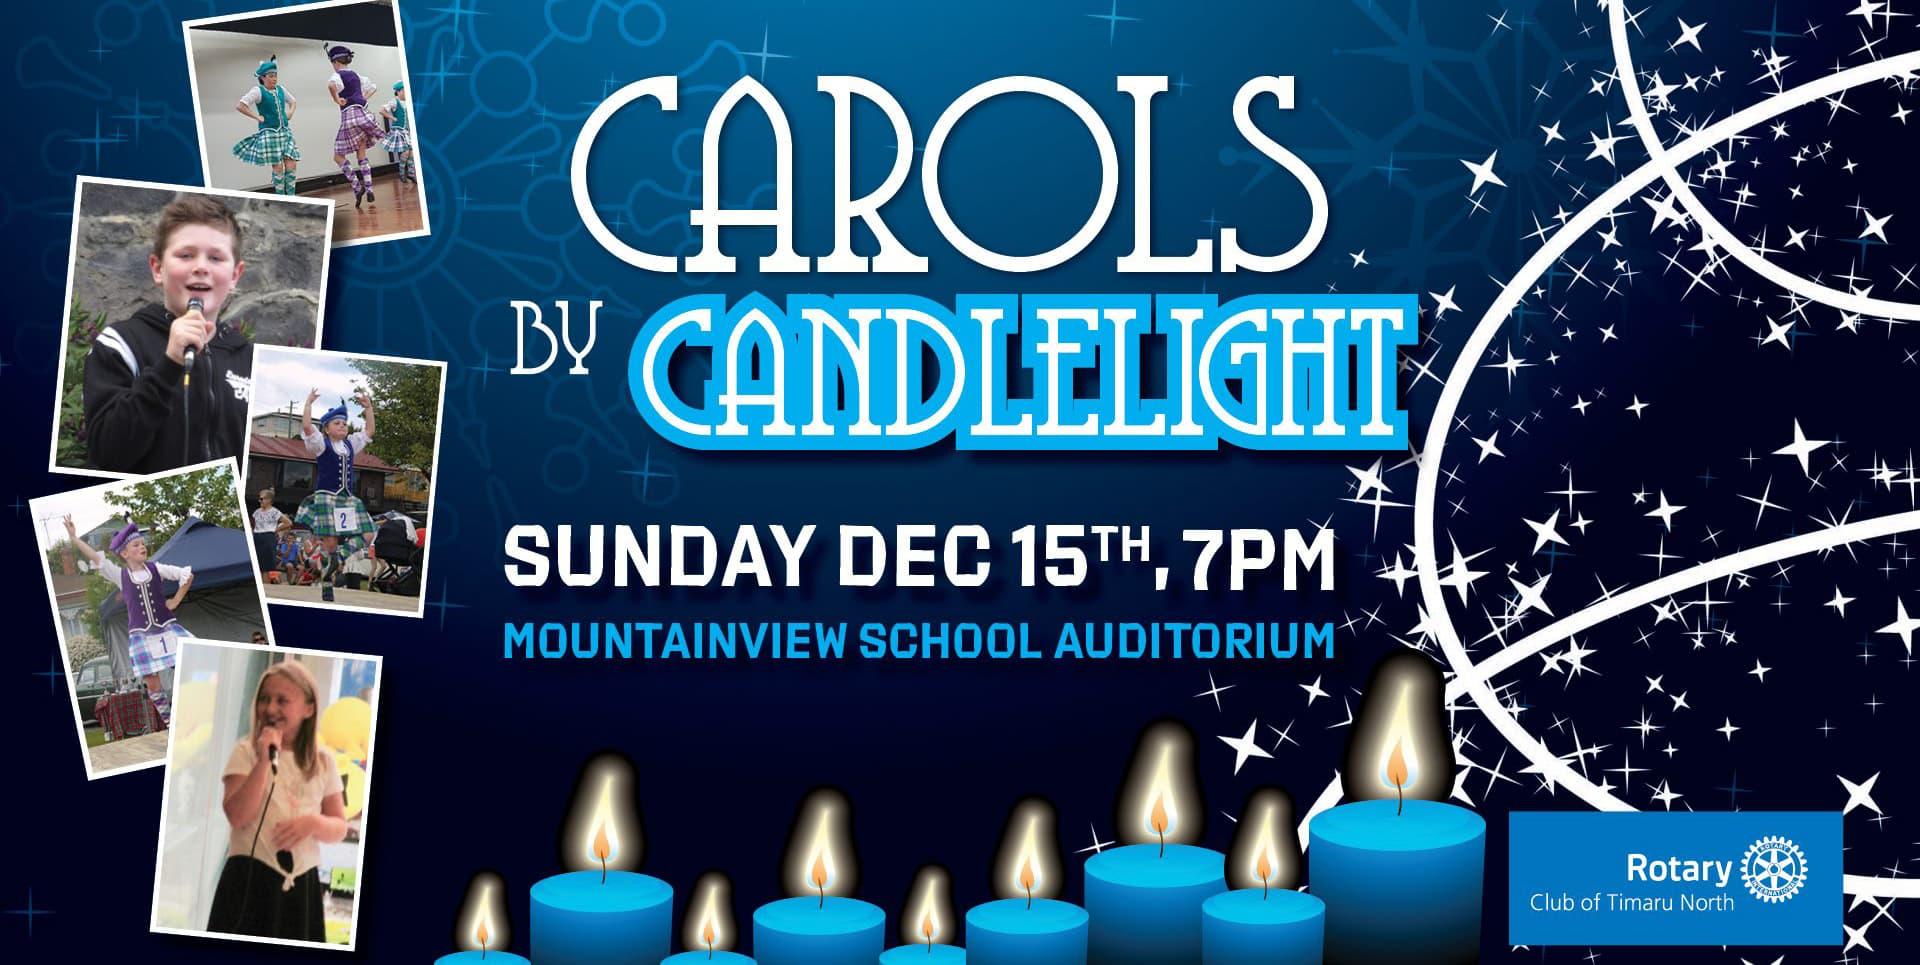 Carols by candlelight Timaru